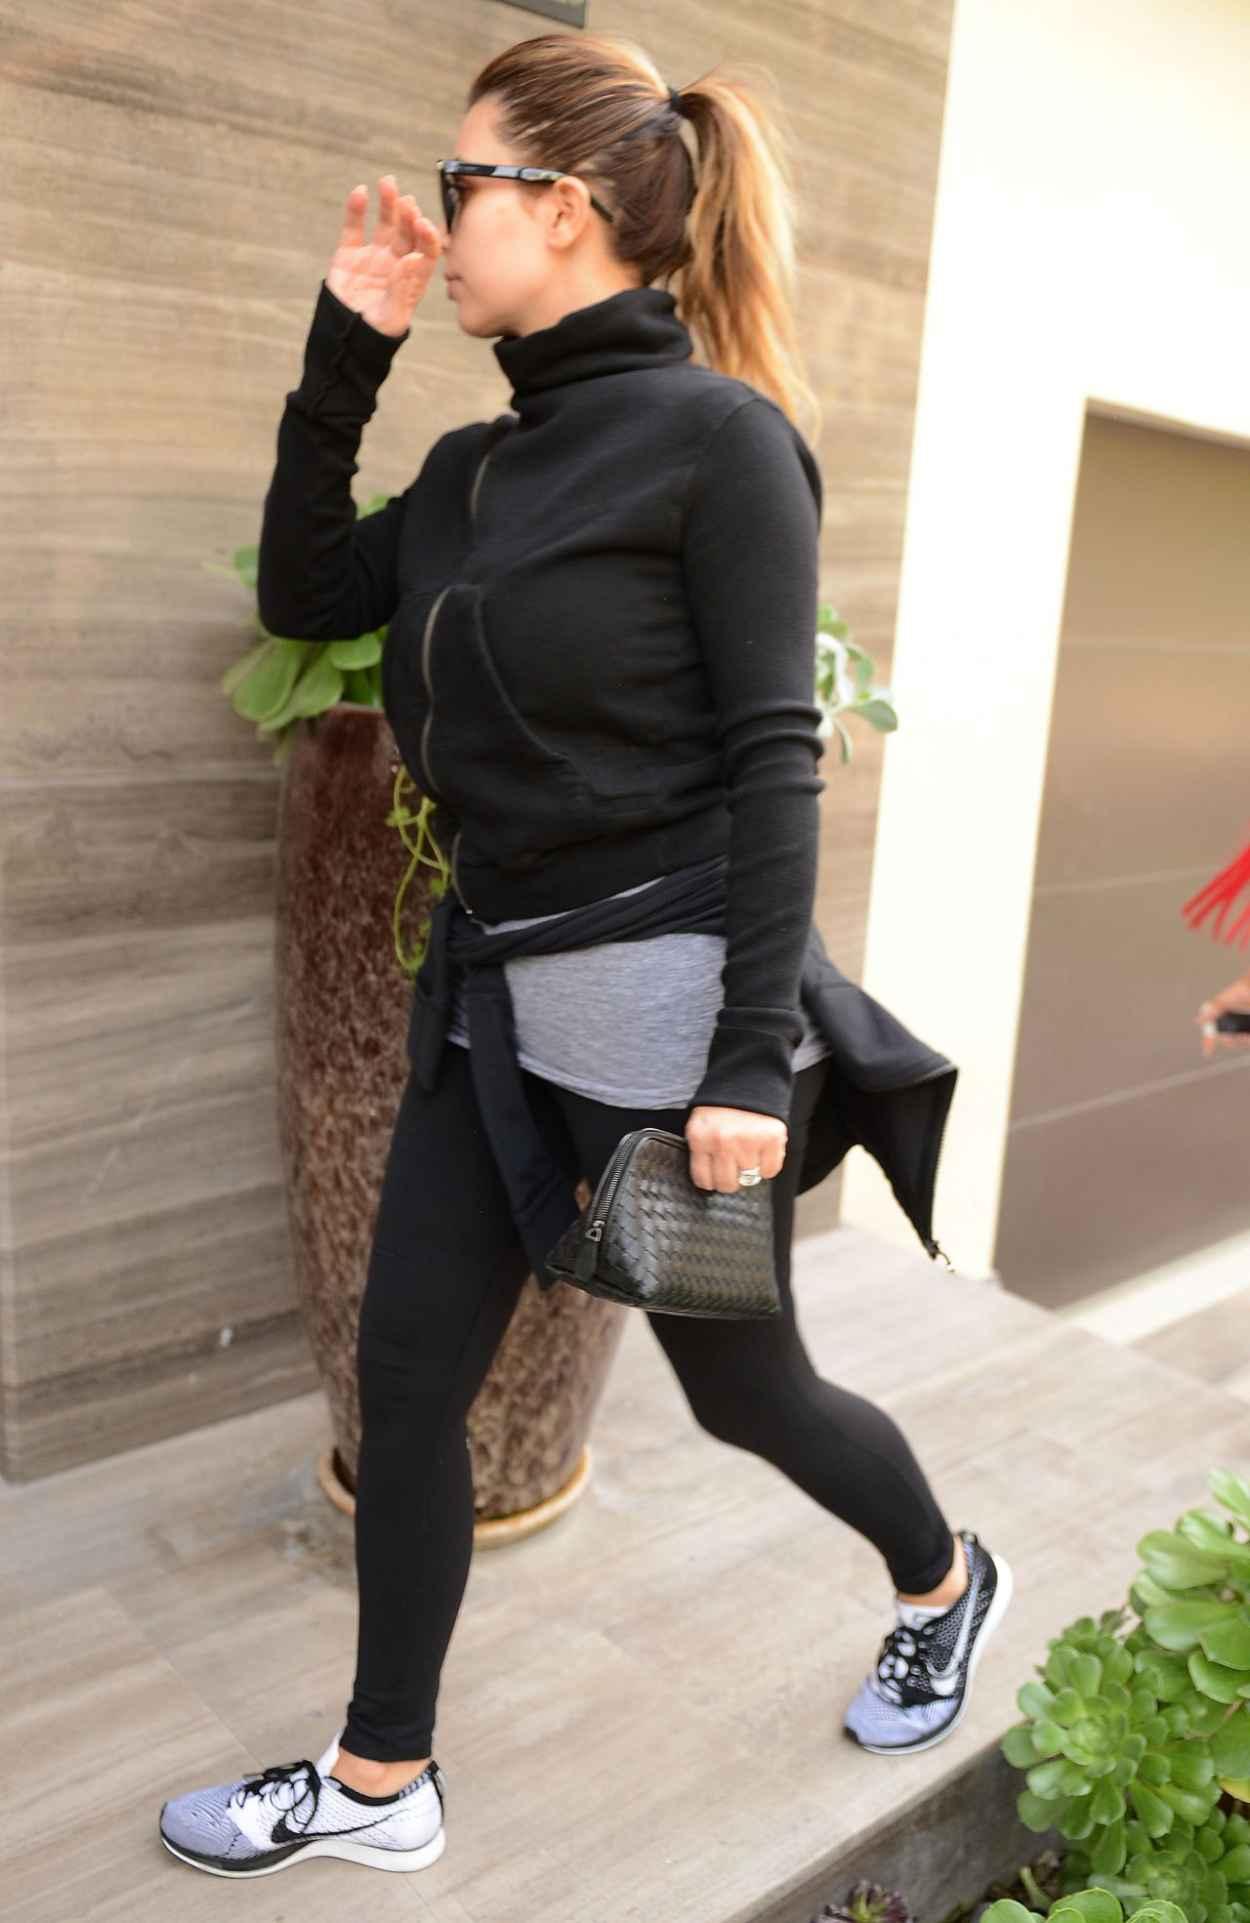 Kim Kardashian Street Style - Visits a Friend in Beverly Hills - December 2015-2